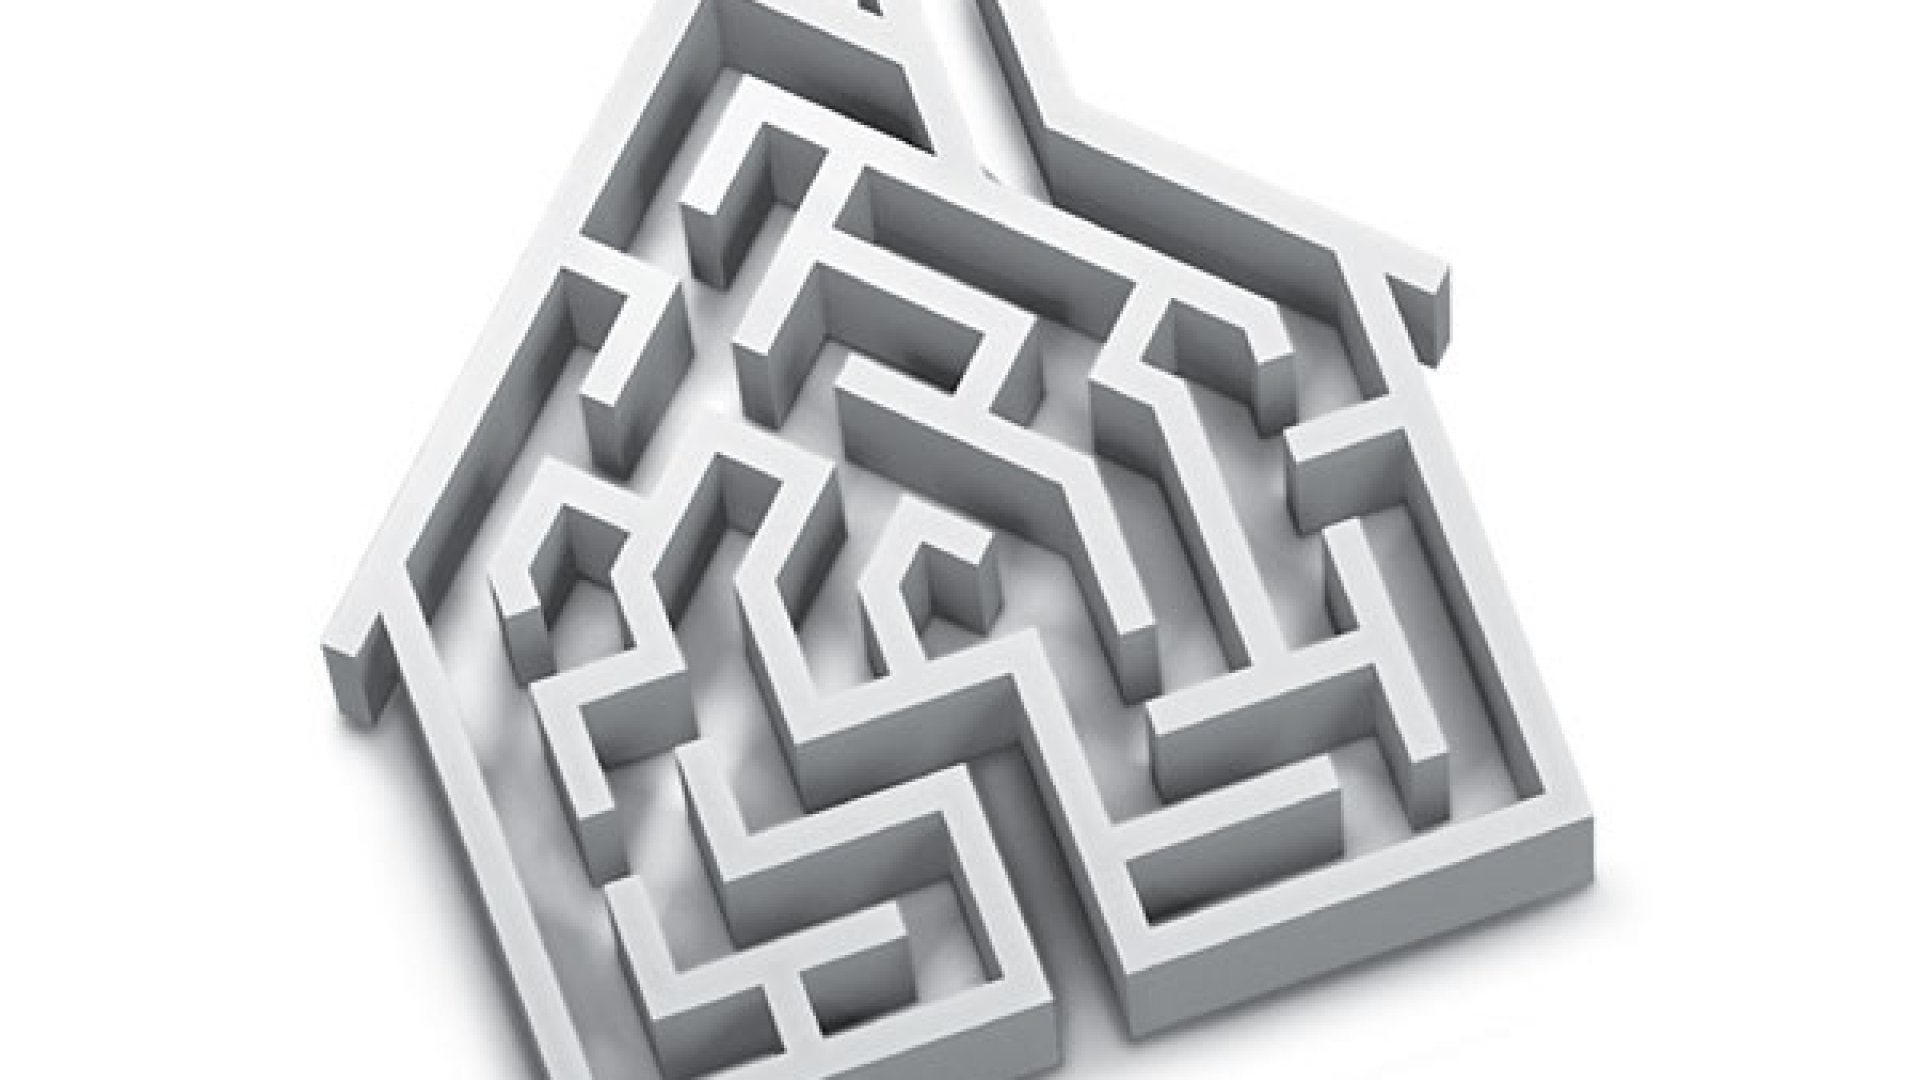 Stop Focusing. See Around Corners Instead.